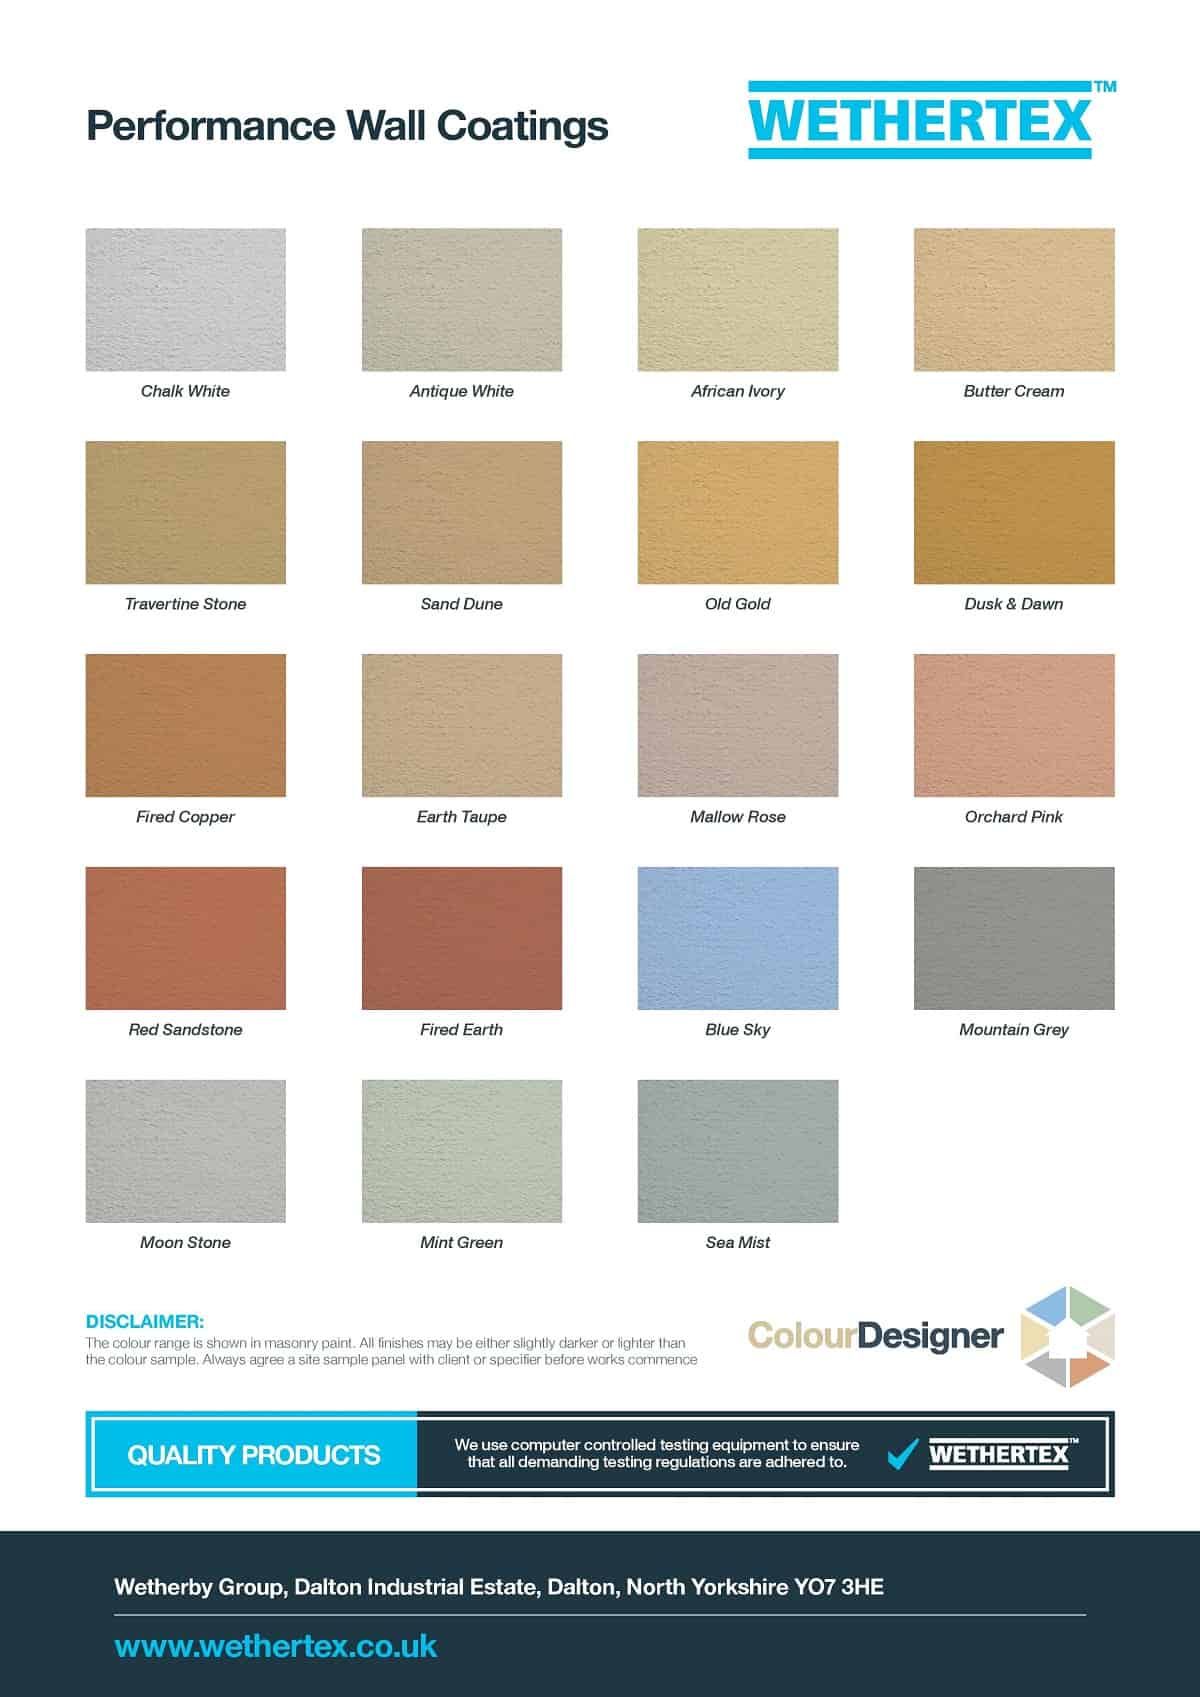 Wethertex MP44 exterior masonry coatings colour chart